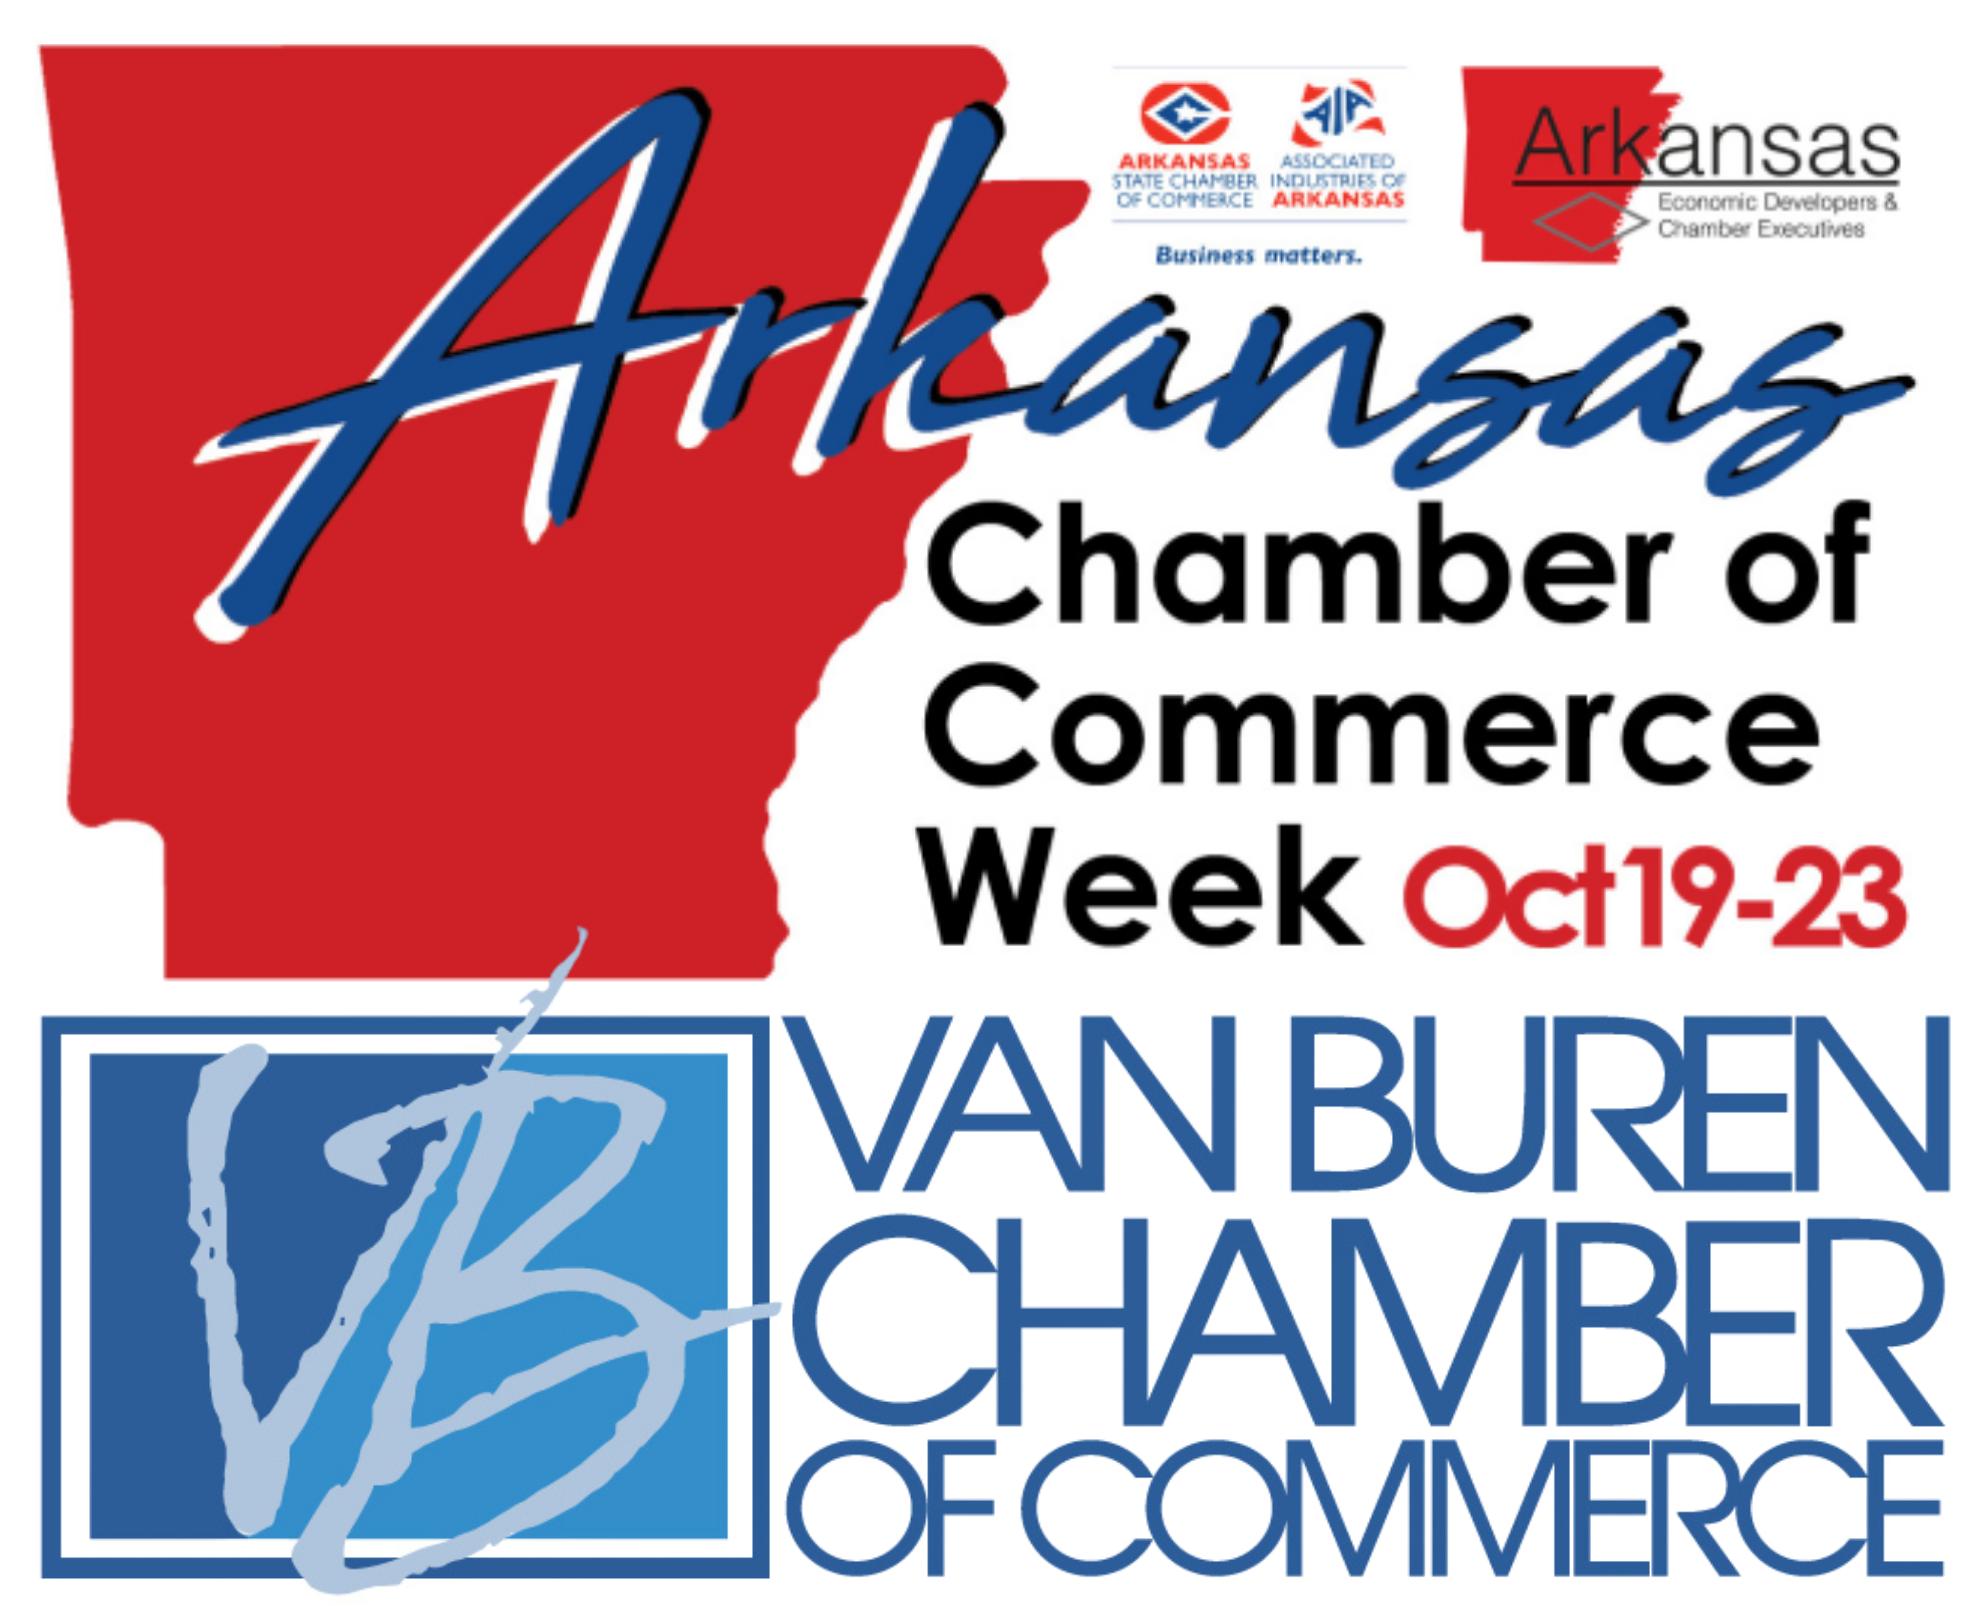 Chamber of Commerce Week 2020